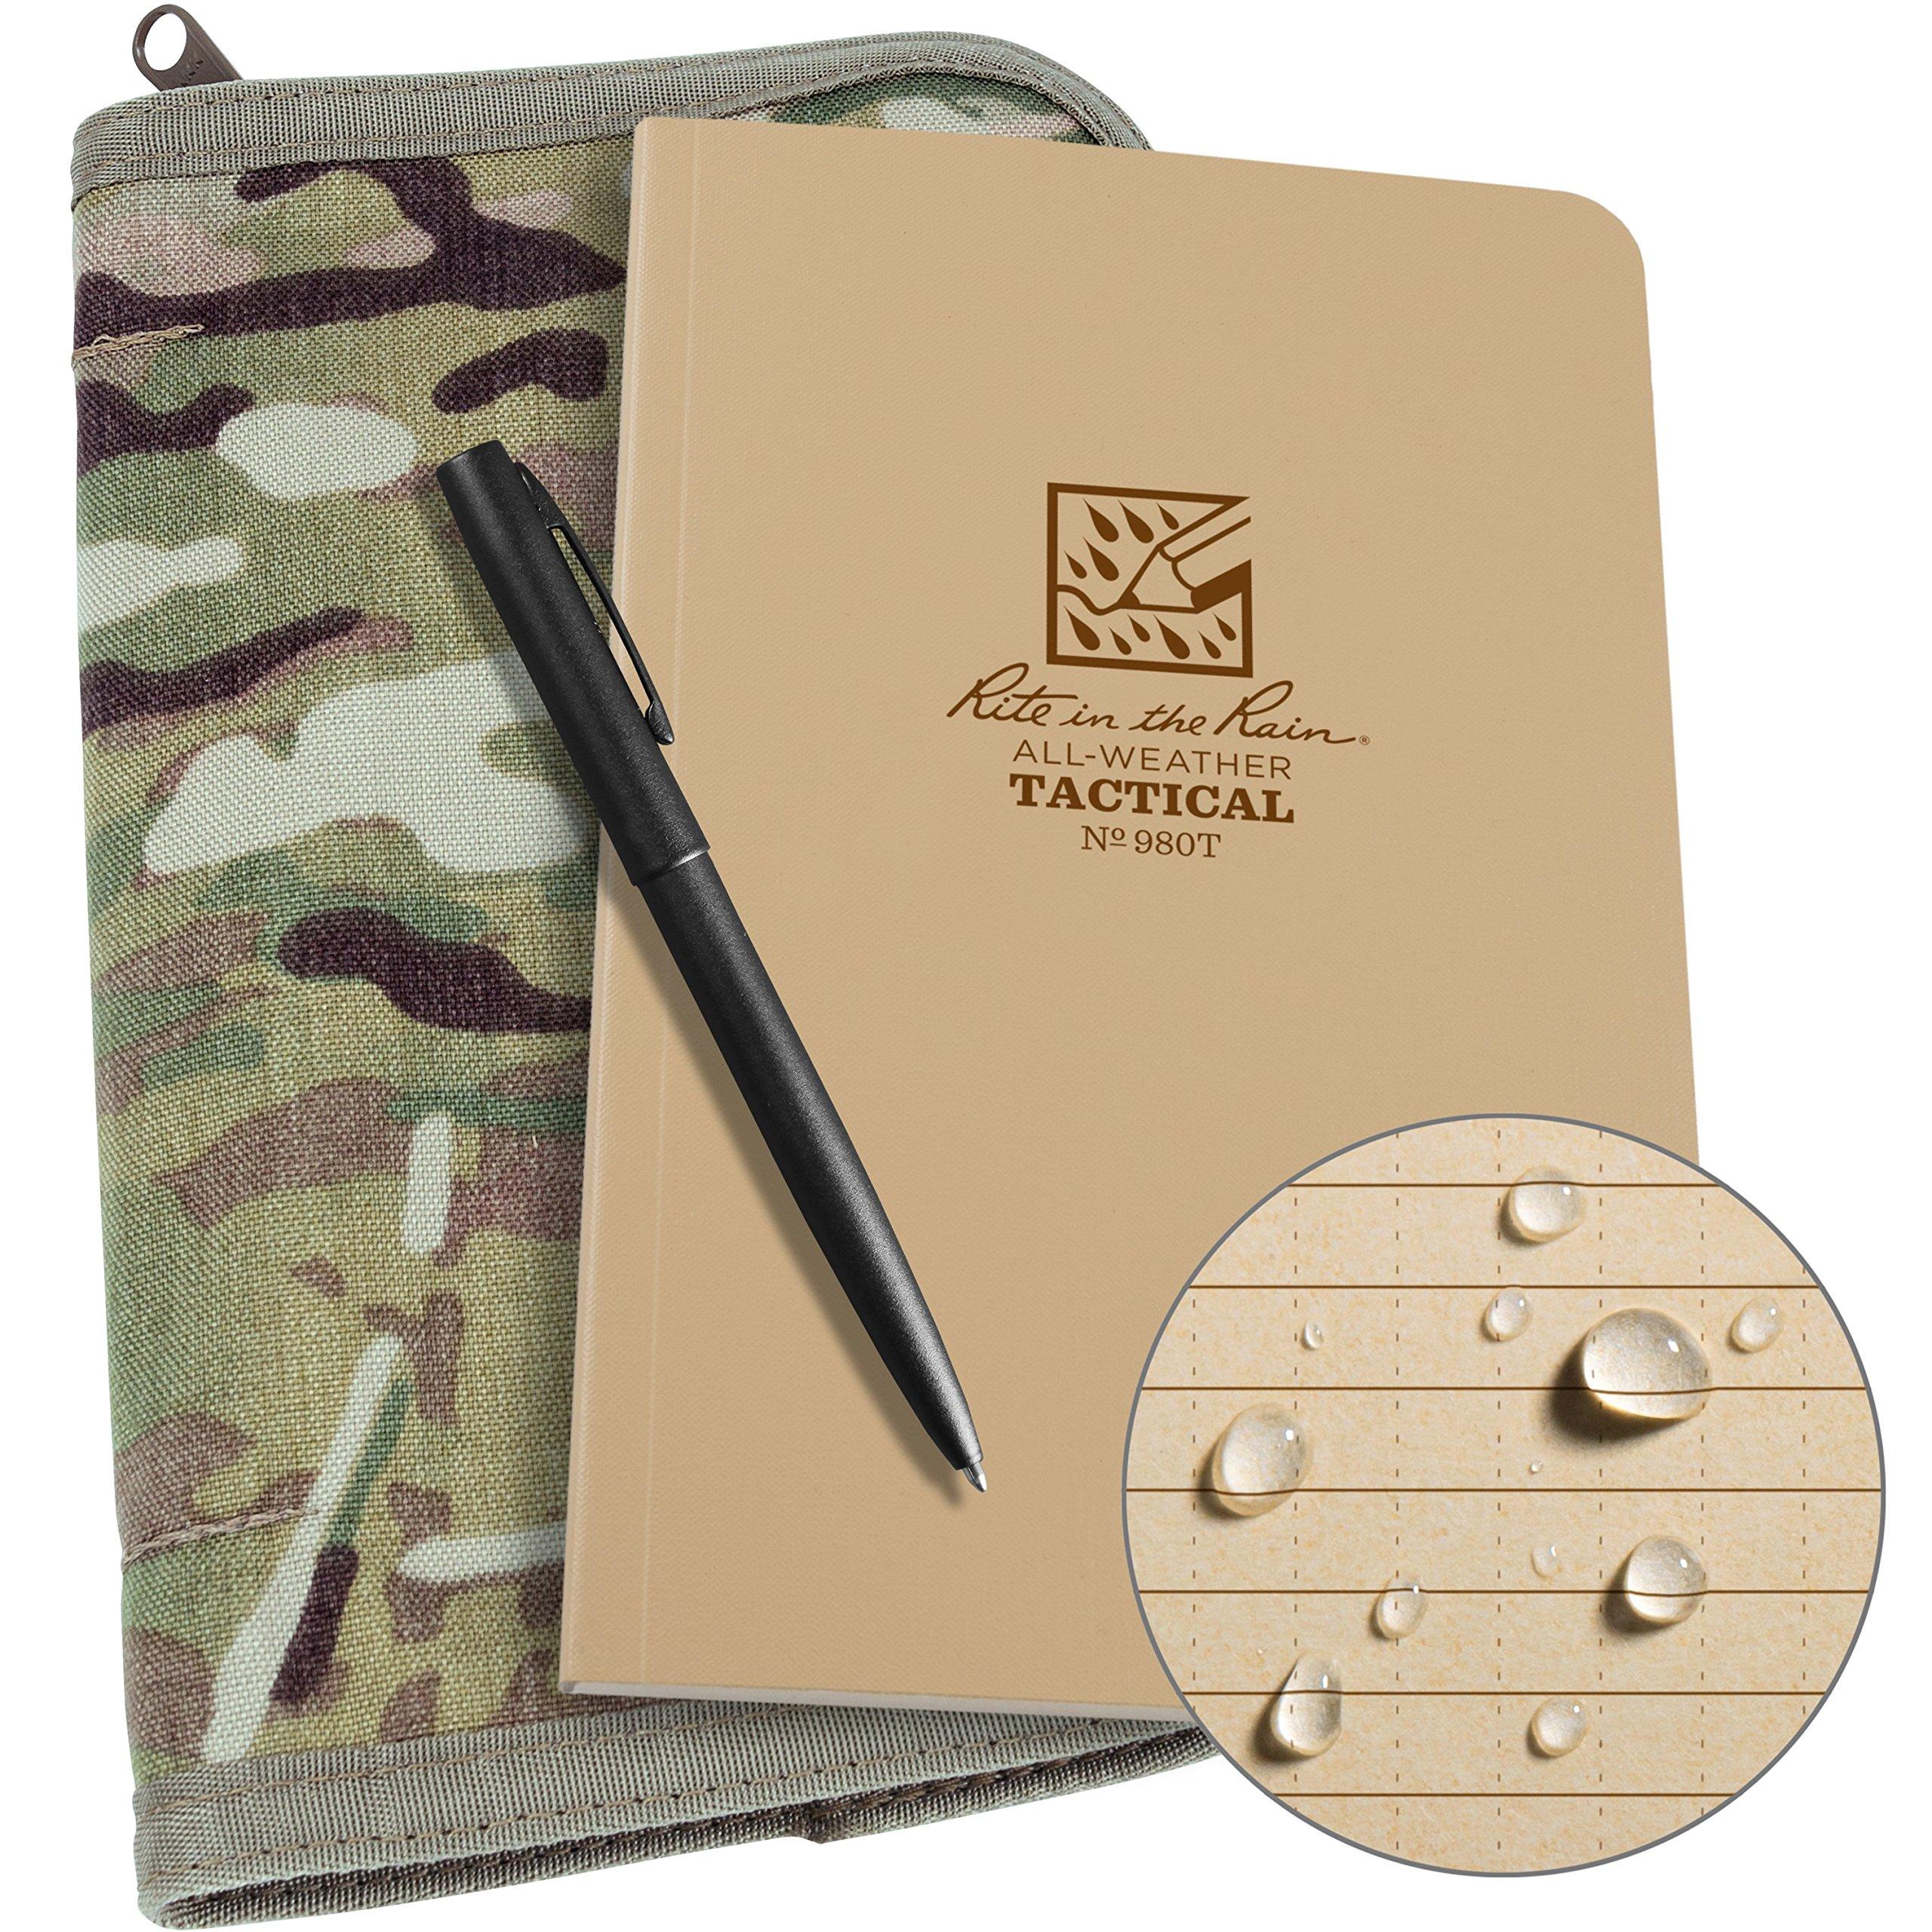 Rite in the Rain Weatherproof Tactical Field Kit: MultiCam CORDURA Fabric Cover, 4 5/8'' x 7 1/4'' Tan Tactical Notebook, Weatherproof Pen (No. 980M-KIT) by Rite In The Rain